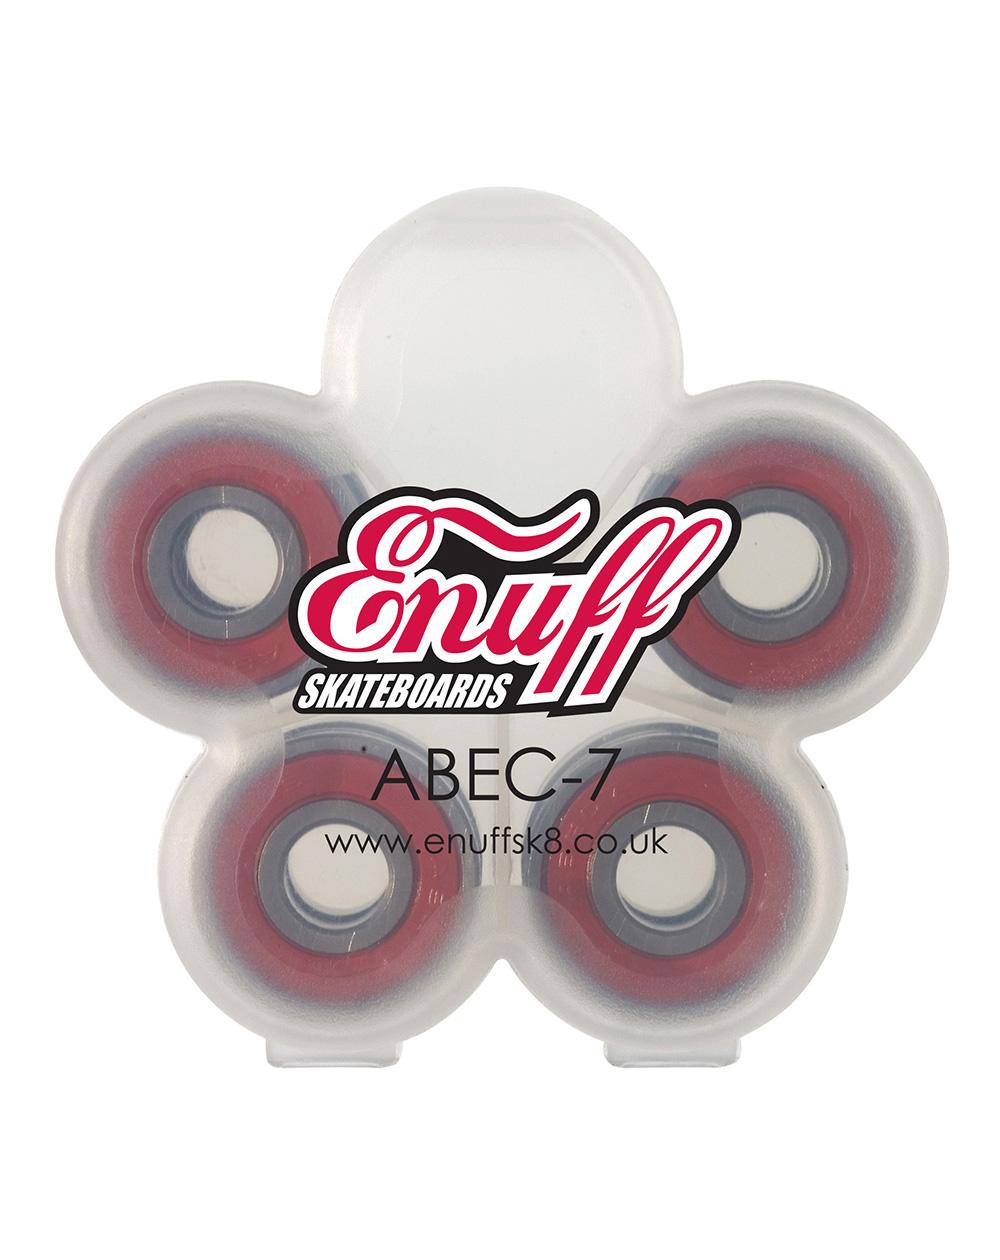 Enuff Roulements Skateboard ABEC-7